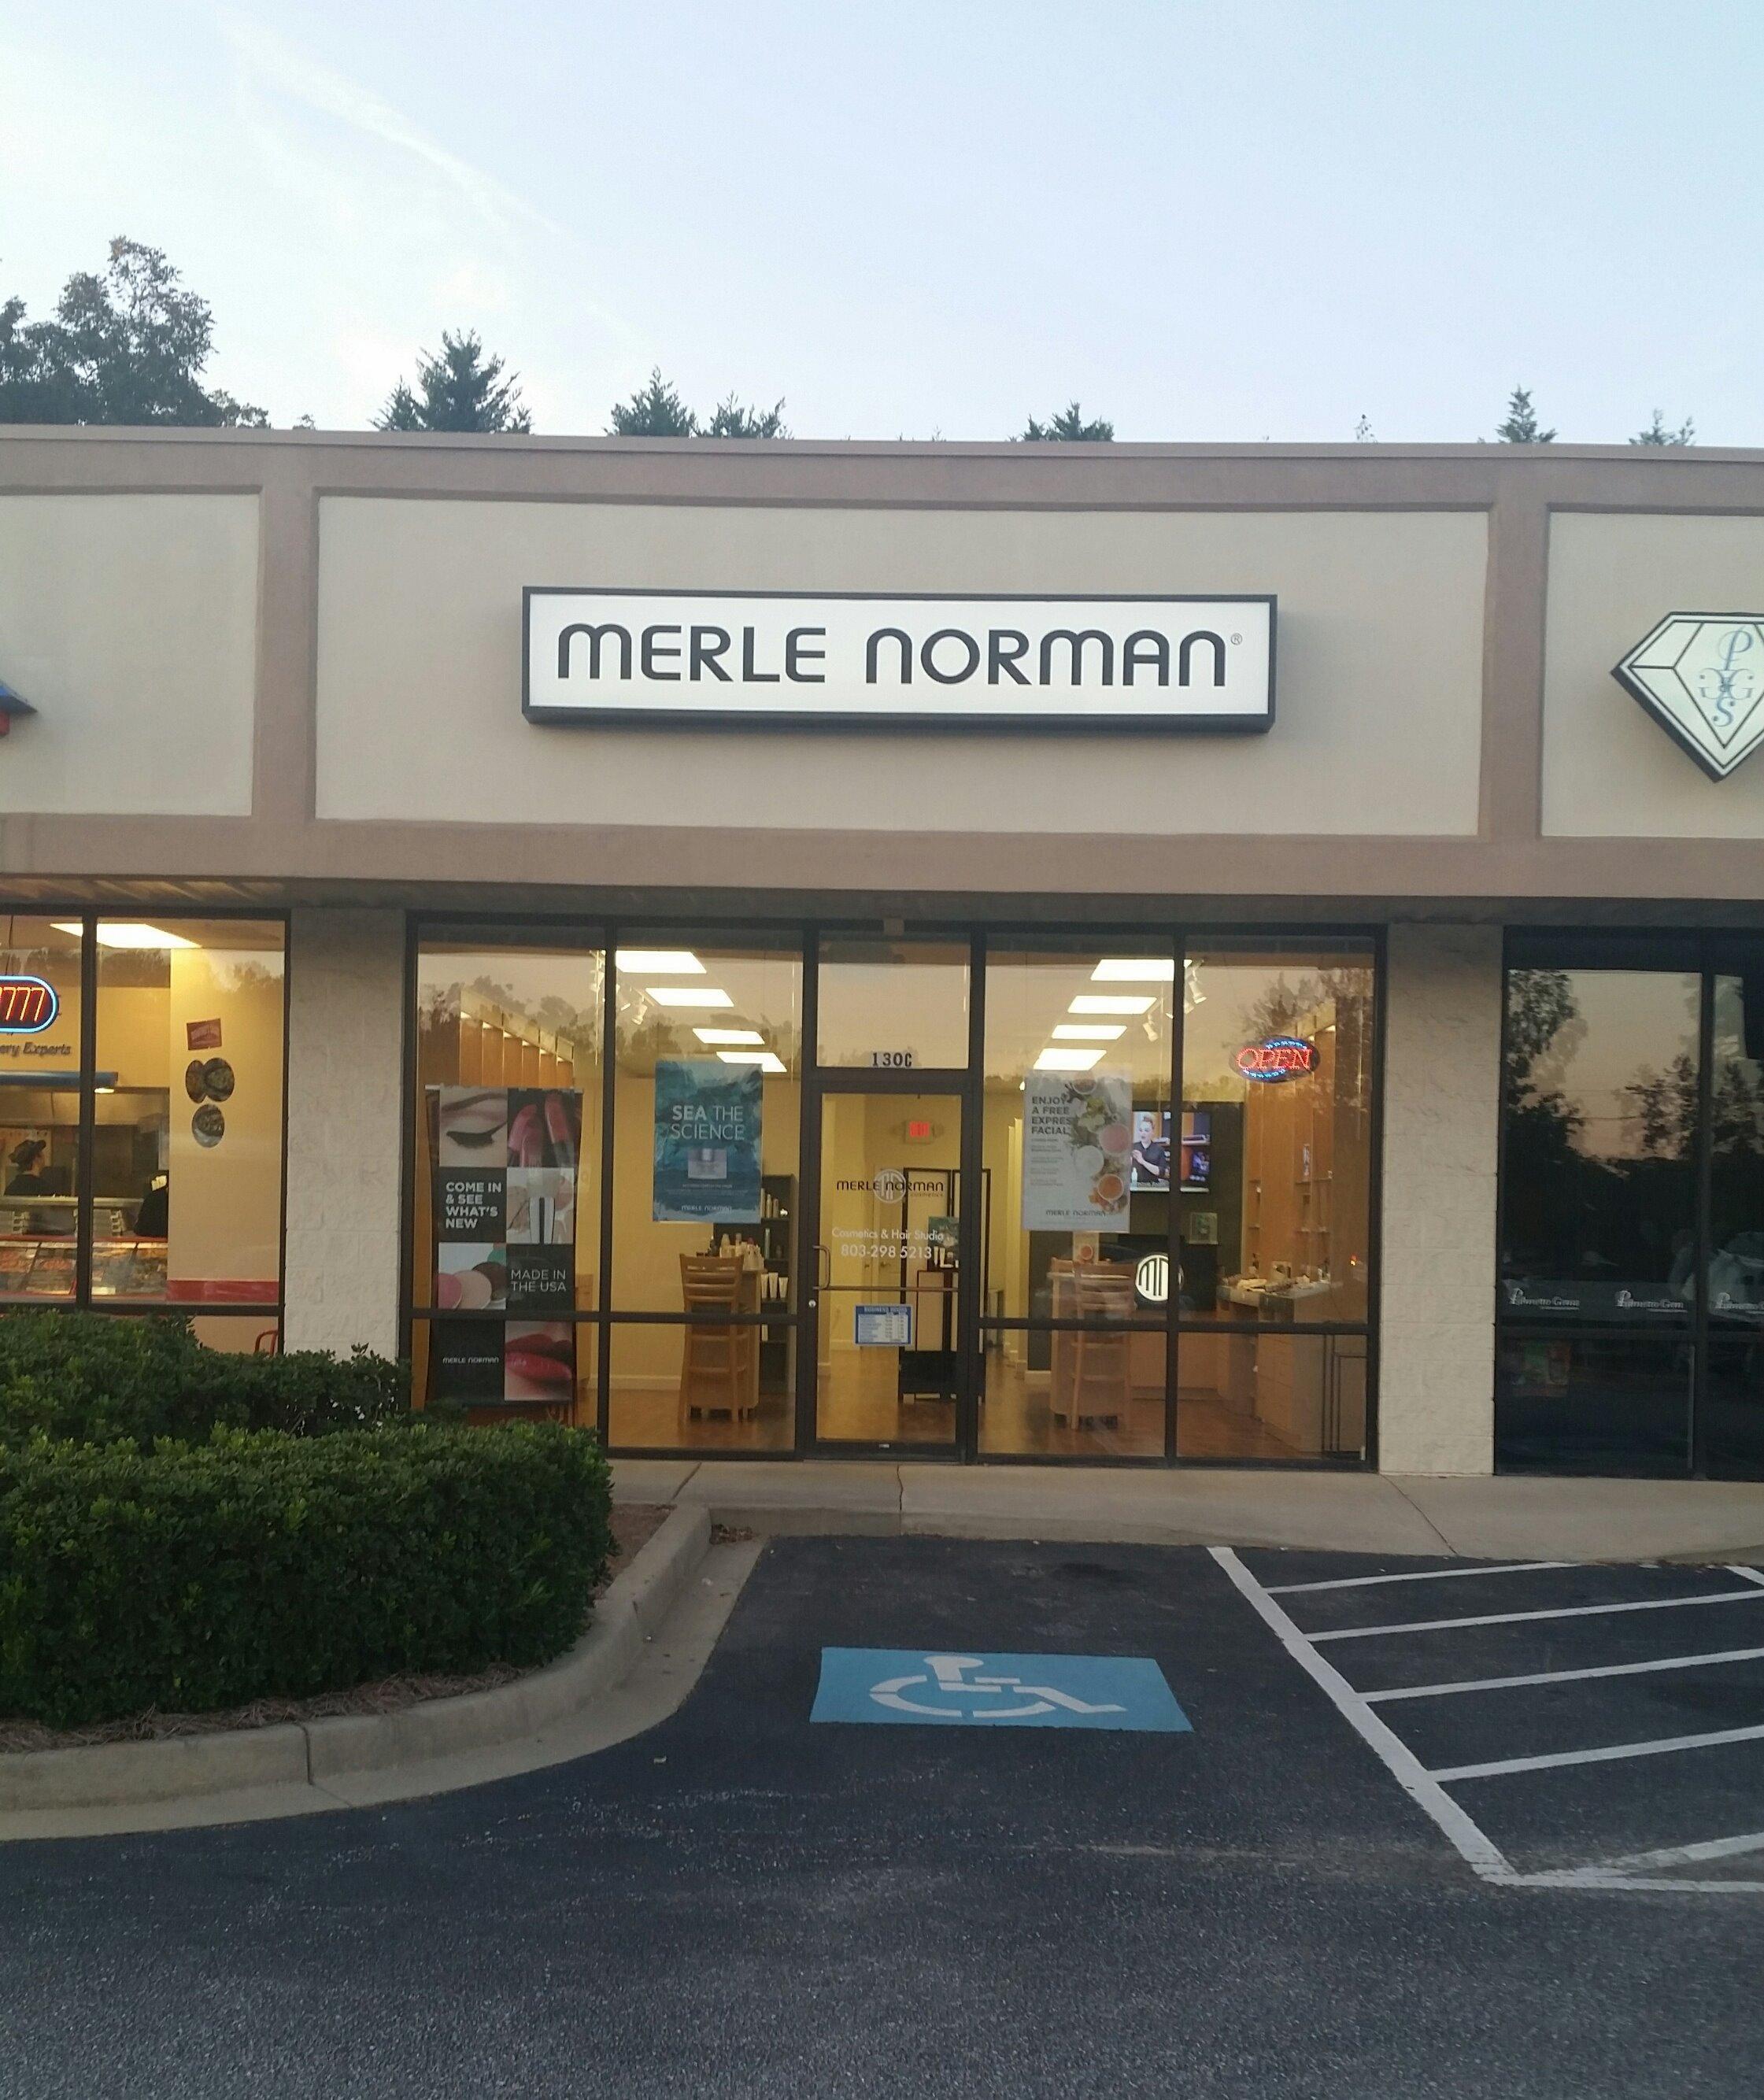 Merle Norman Cosmetics & Hair Studio, Chapin South Carolina (SC) - LocalDatabase.com